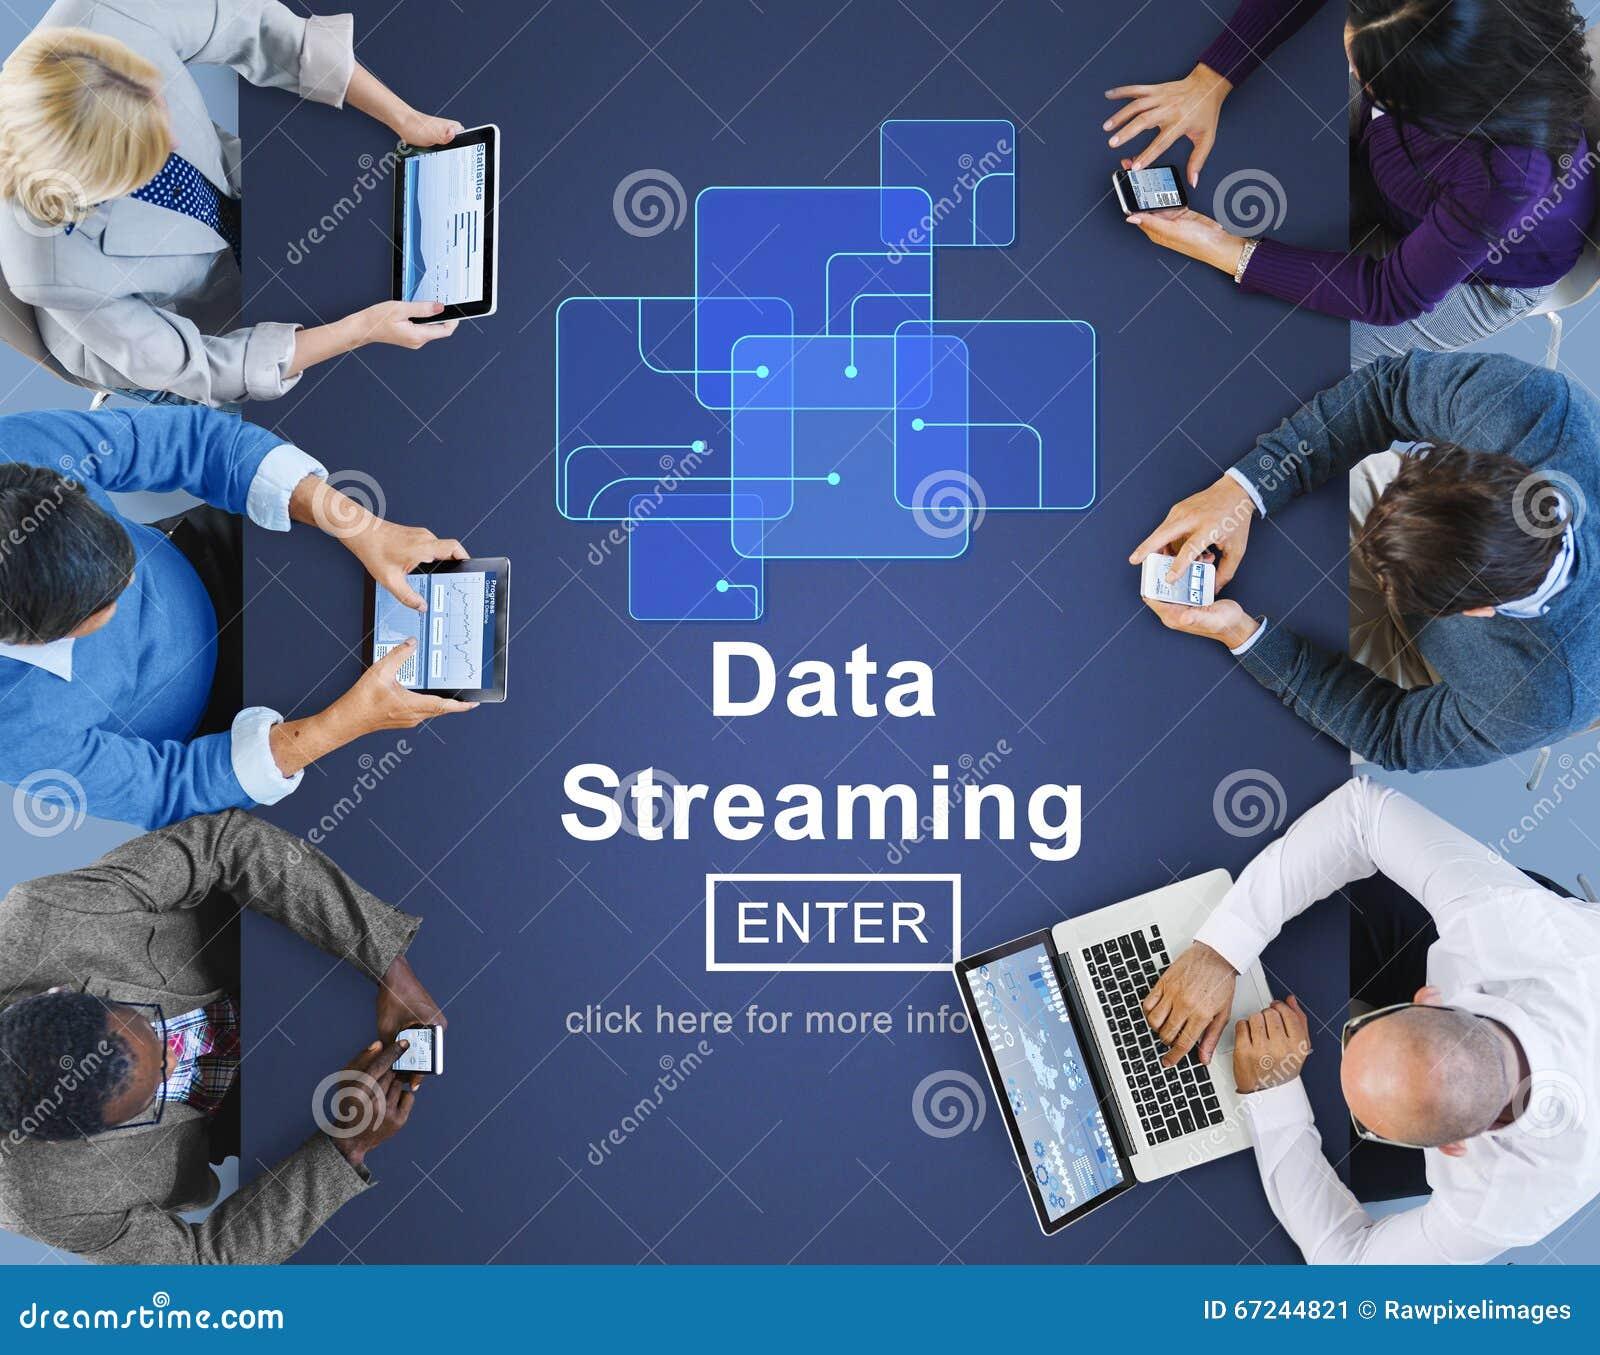 Data Streaming Online Web Media Concept